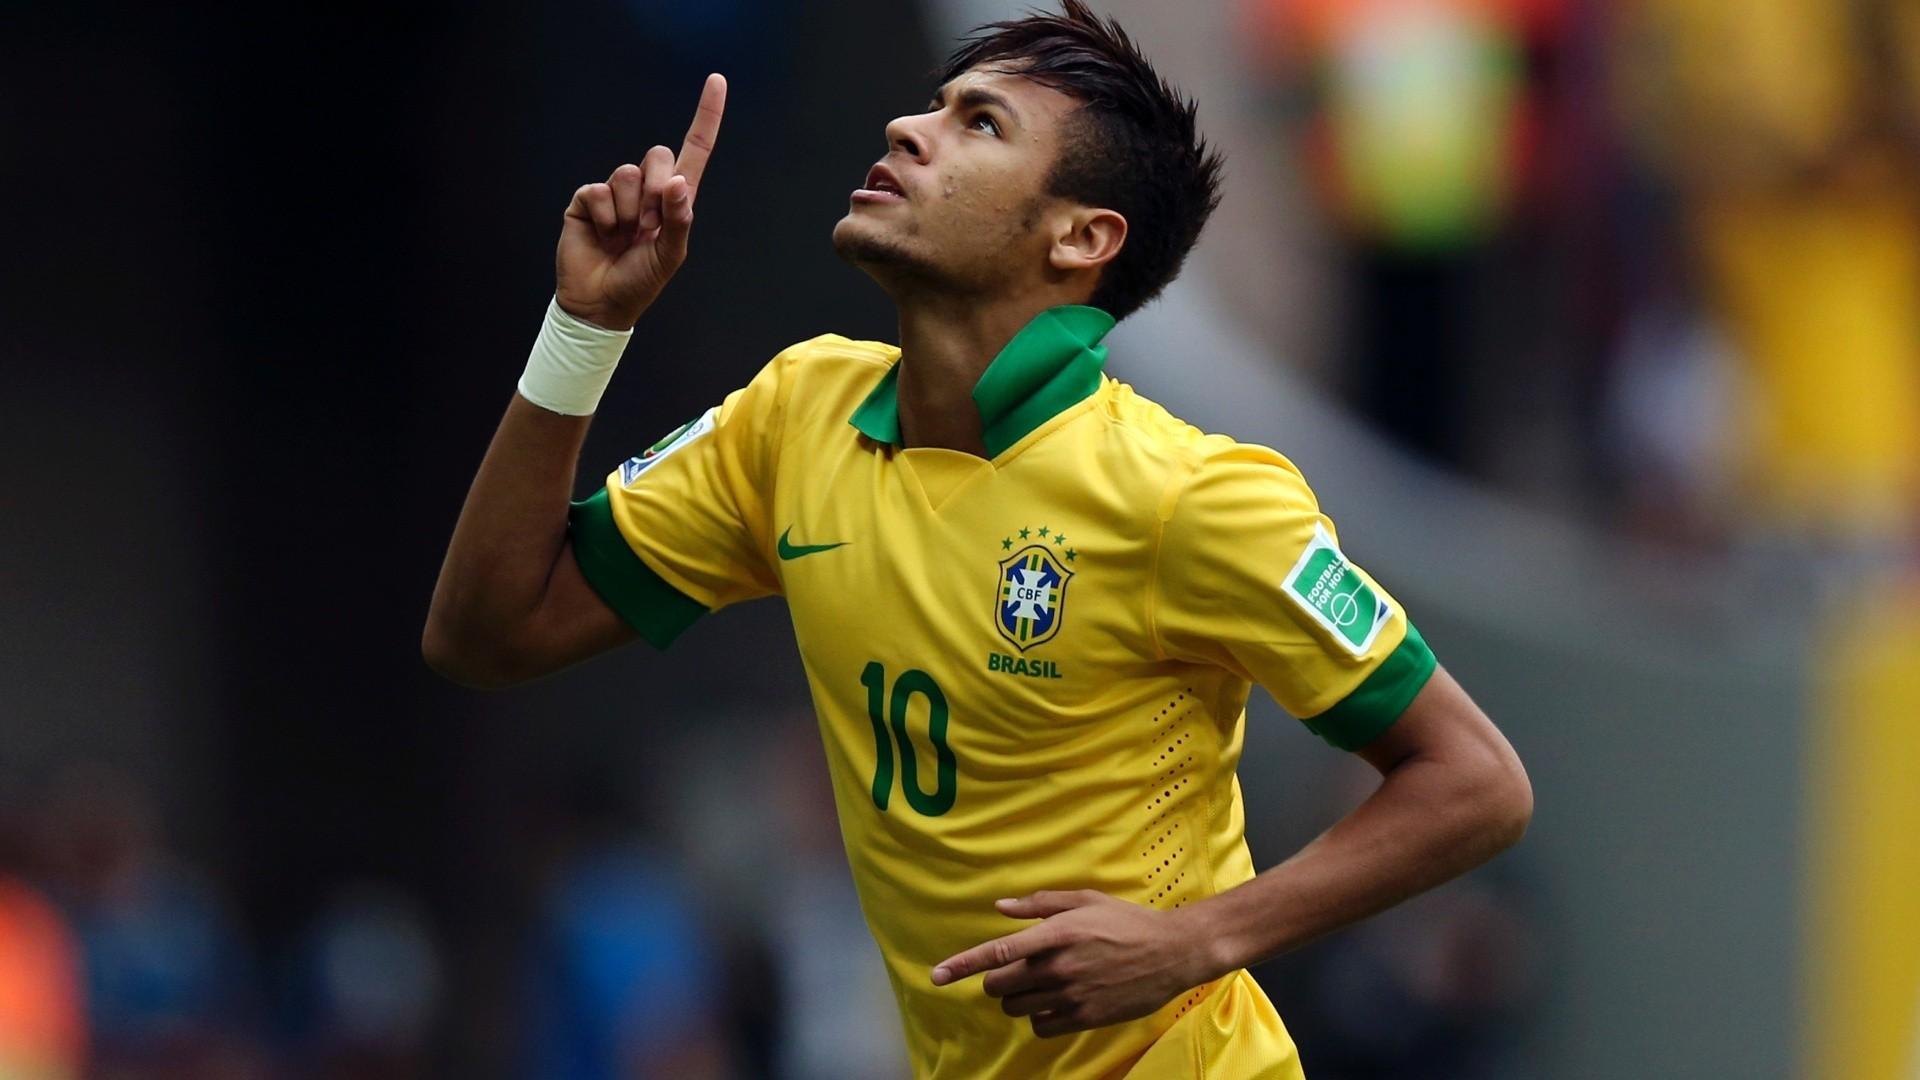 Res: 1920x1080, Neymar Wallpaper